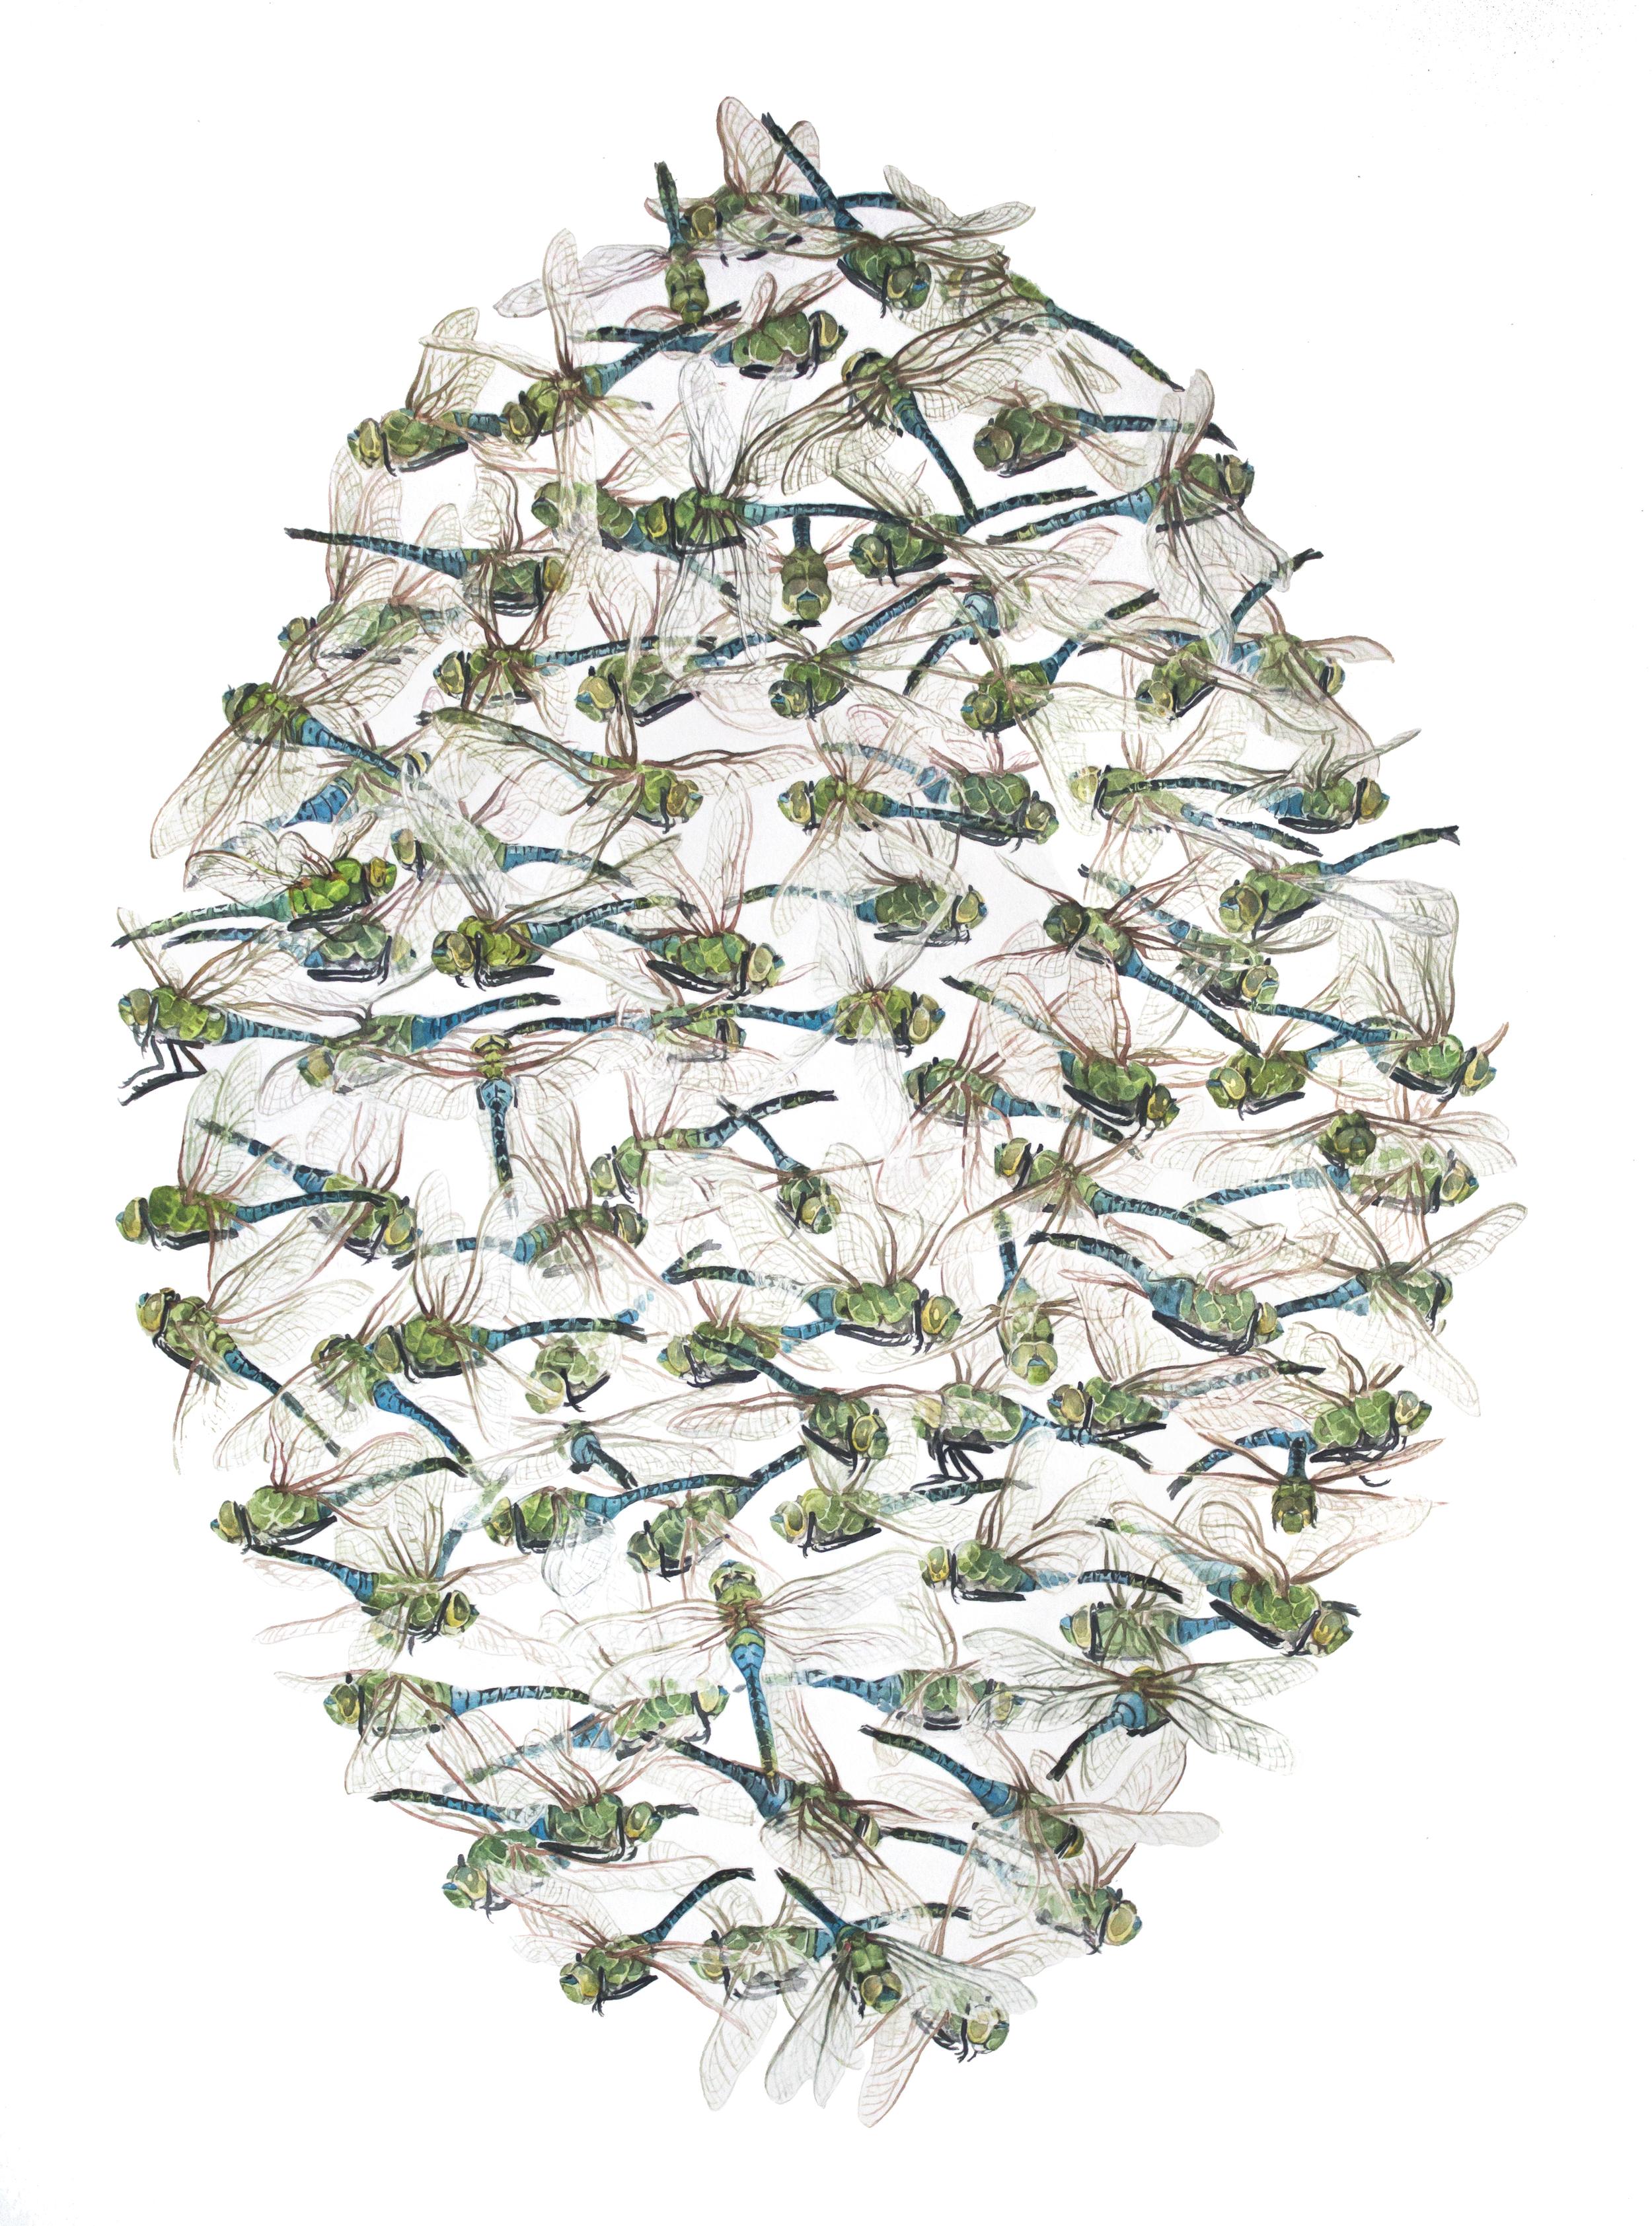 Green Darner Dragonflies